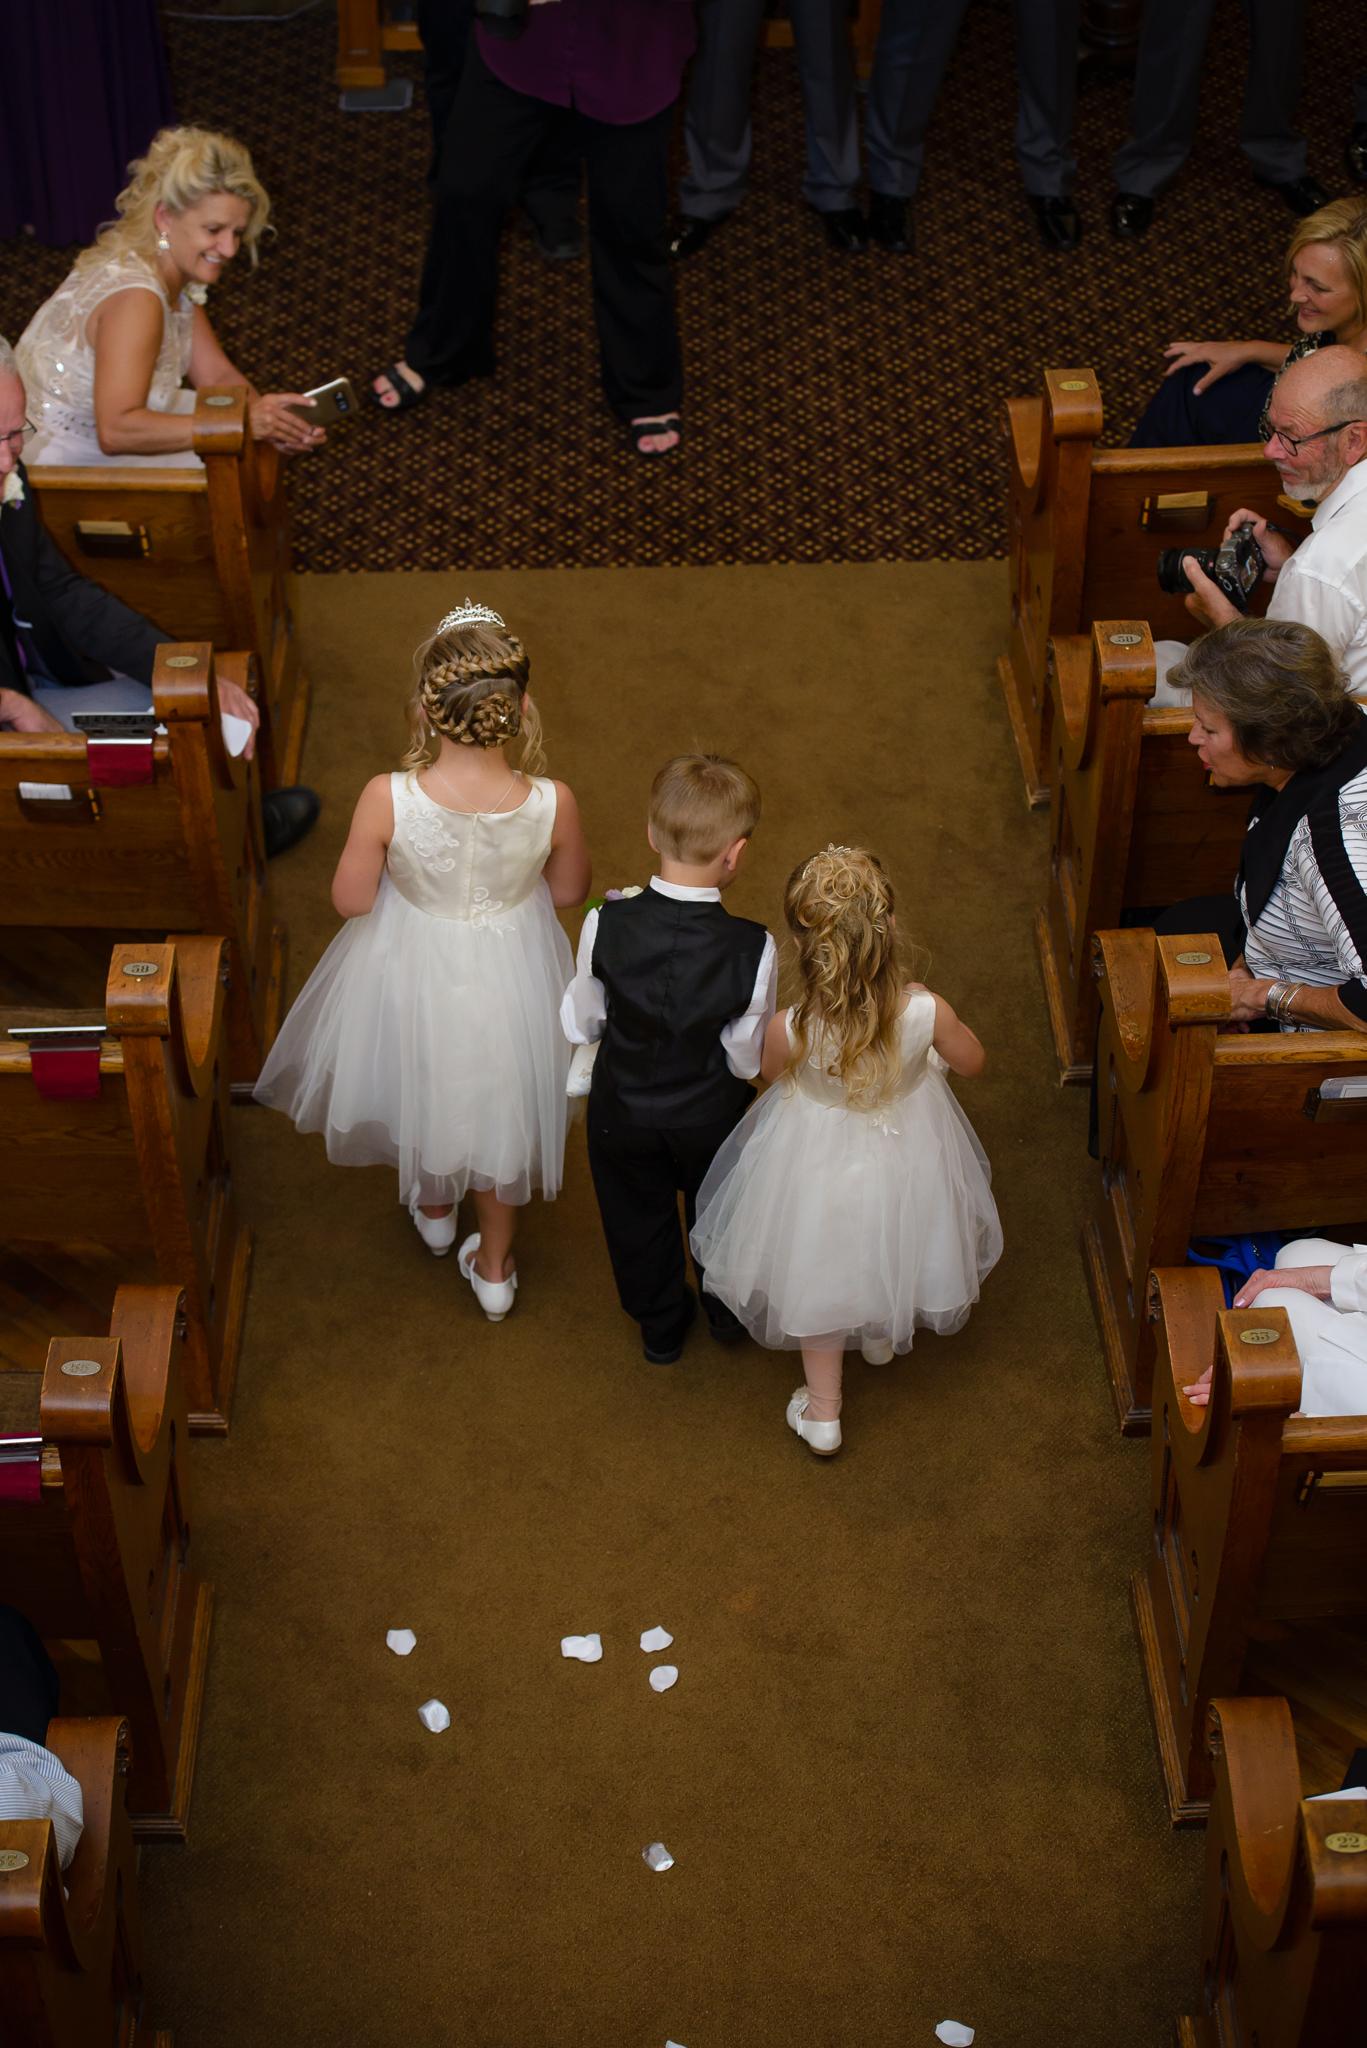 5-ashland washburn wedding photographyDSC_3670.jpg